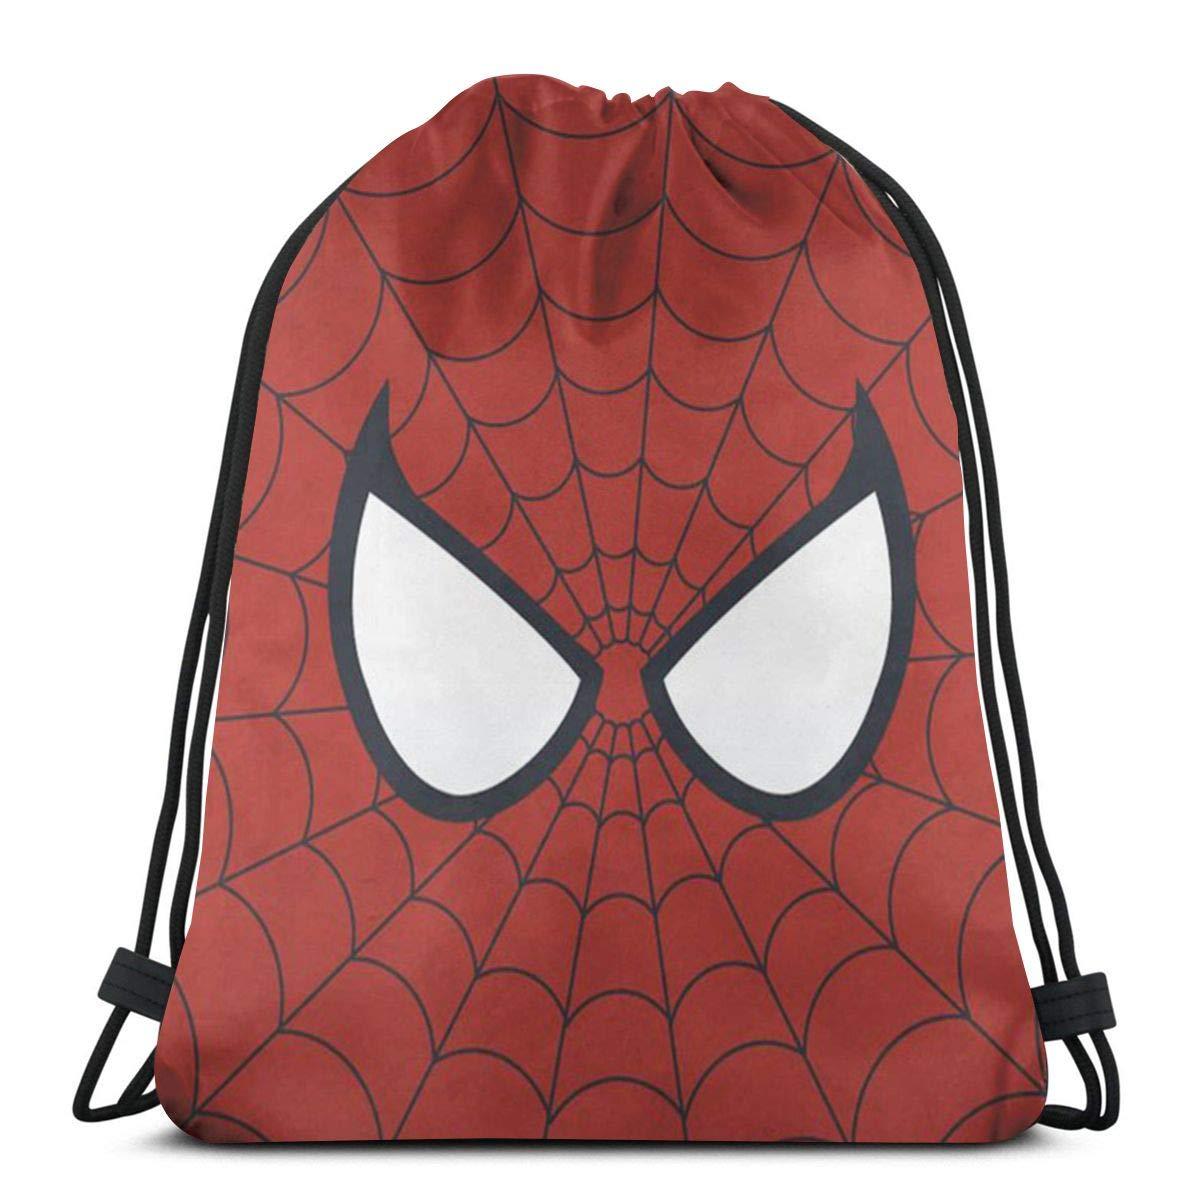 MPJTJGWZ クラシック巾着バッグ スパイダーマン ジム バックパック ショルダーバッグ スポーツ収納バッグ 男女兼用 B07QNTPF8B